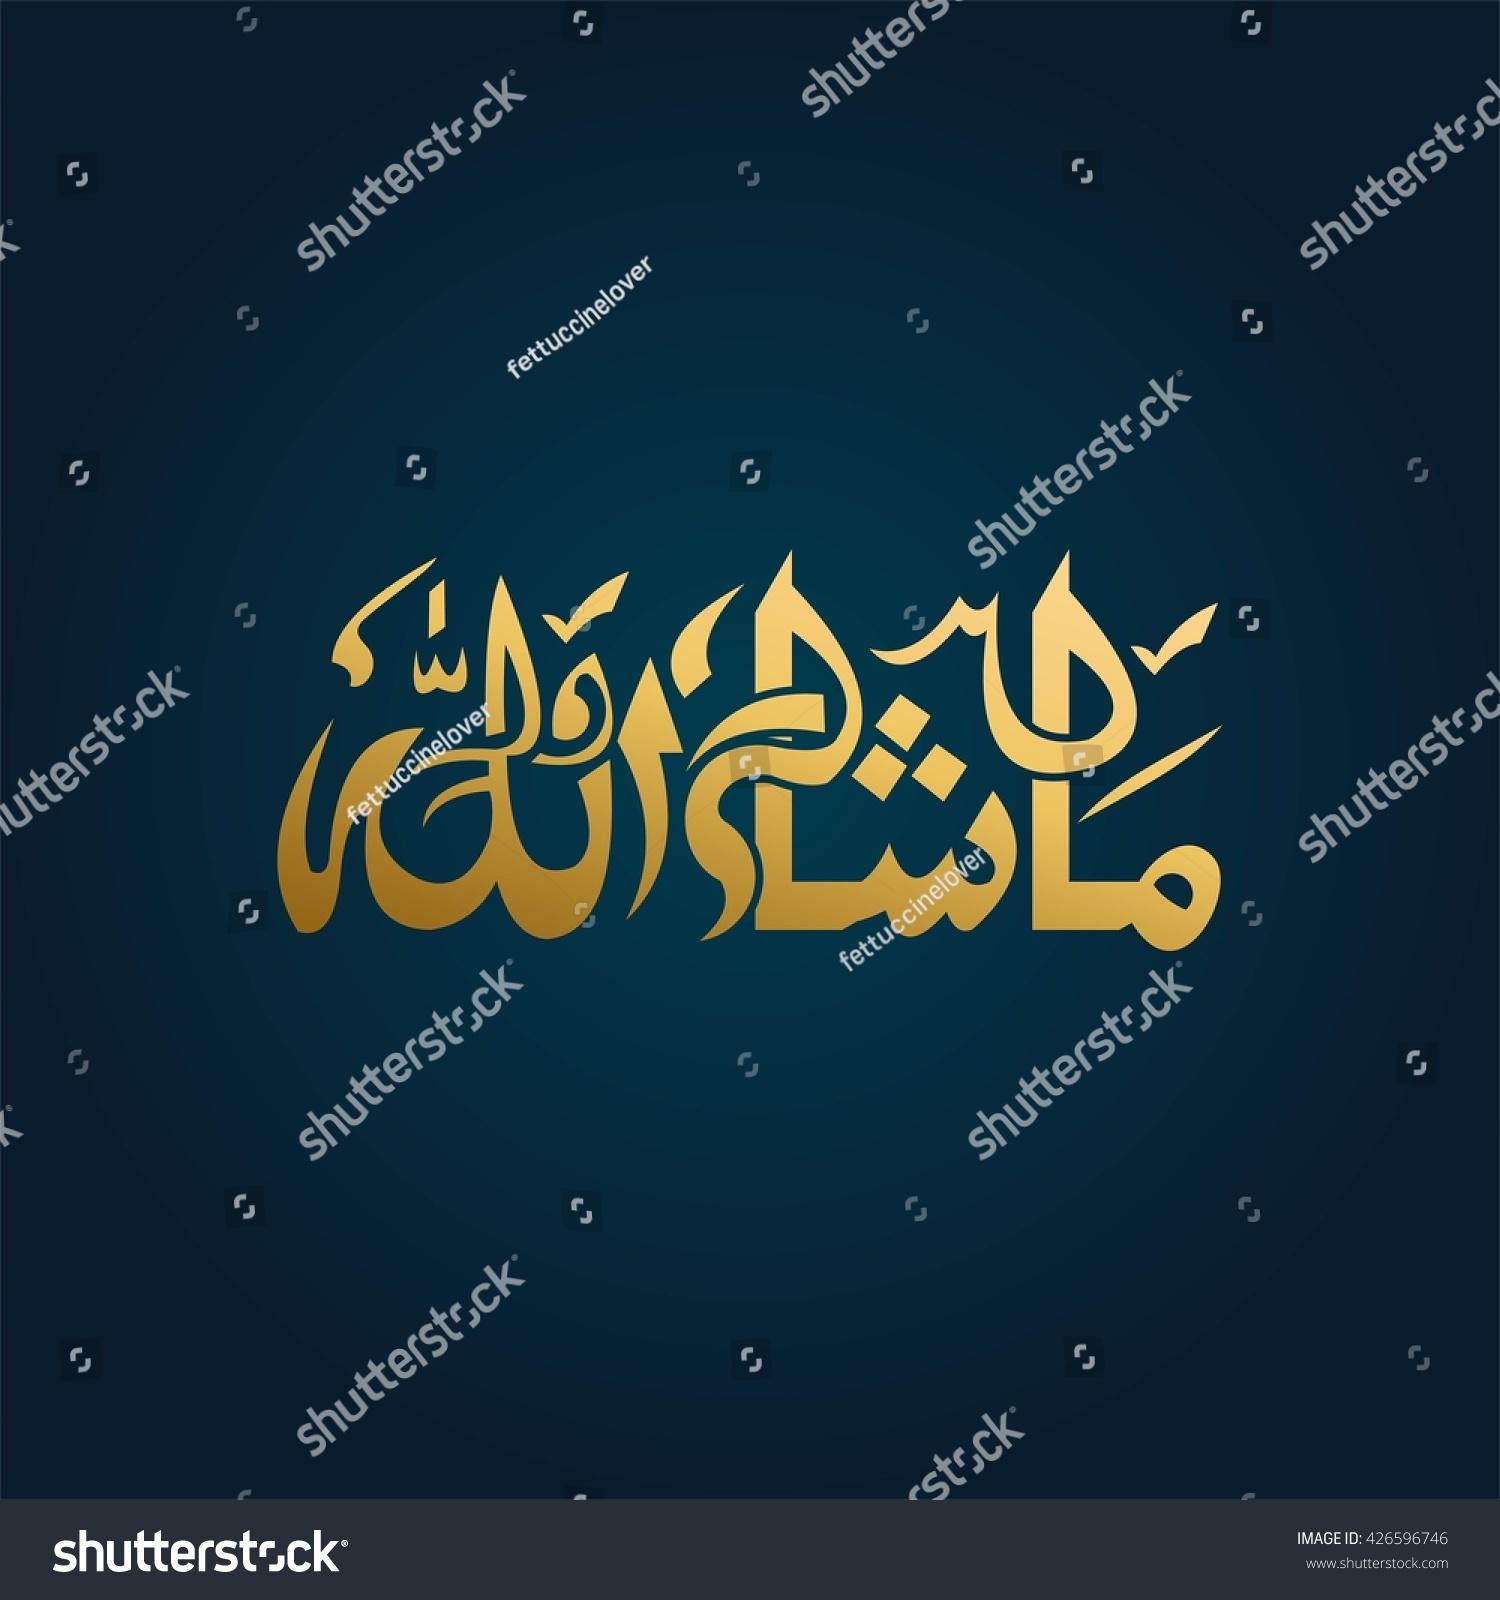 Royalty Free Vector Arabic Calligraphy Translation